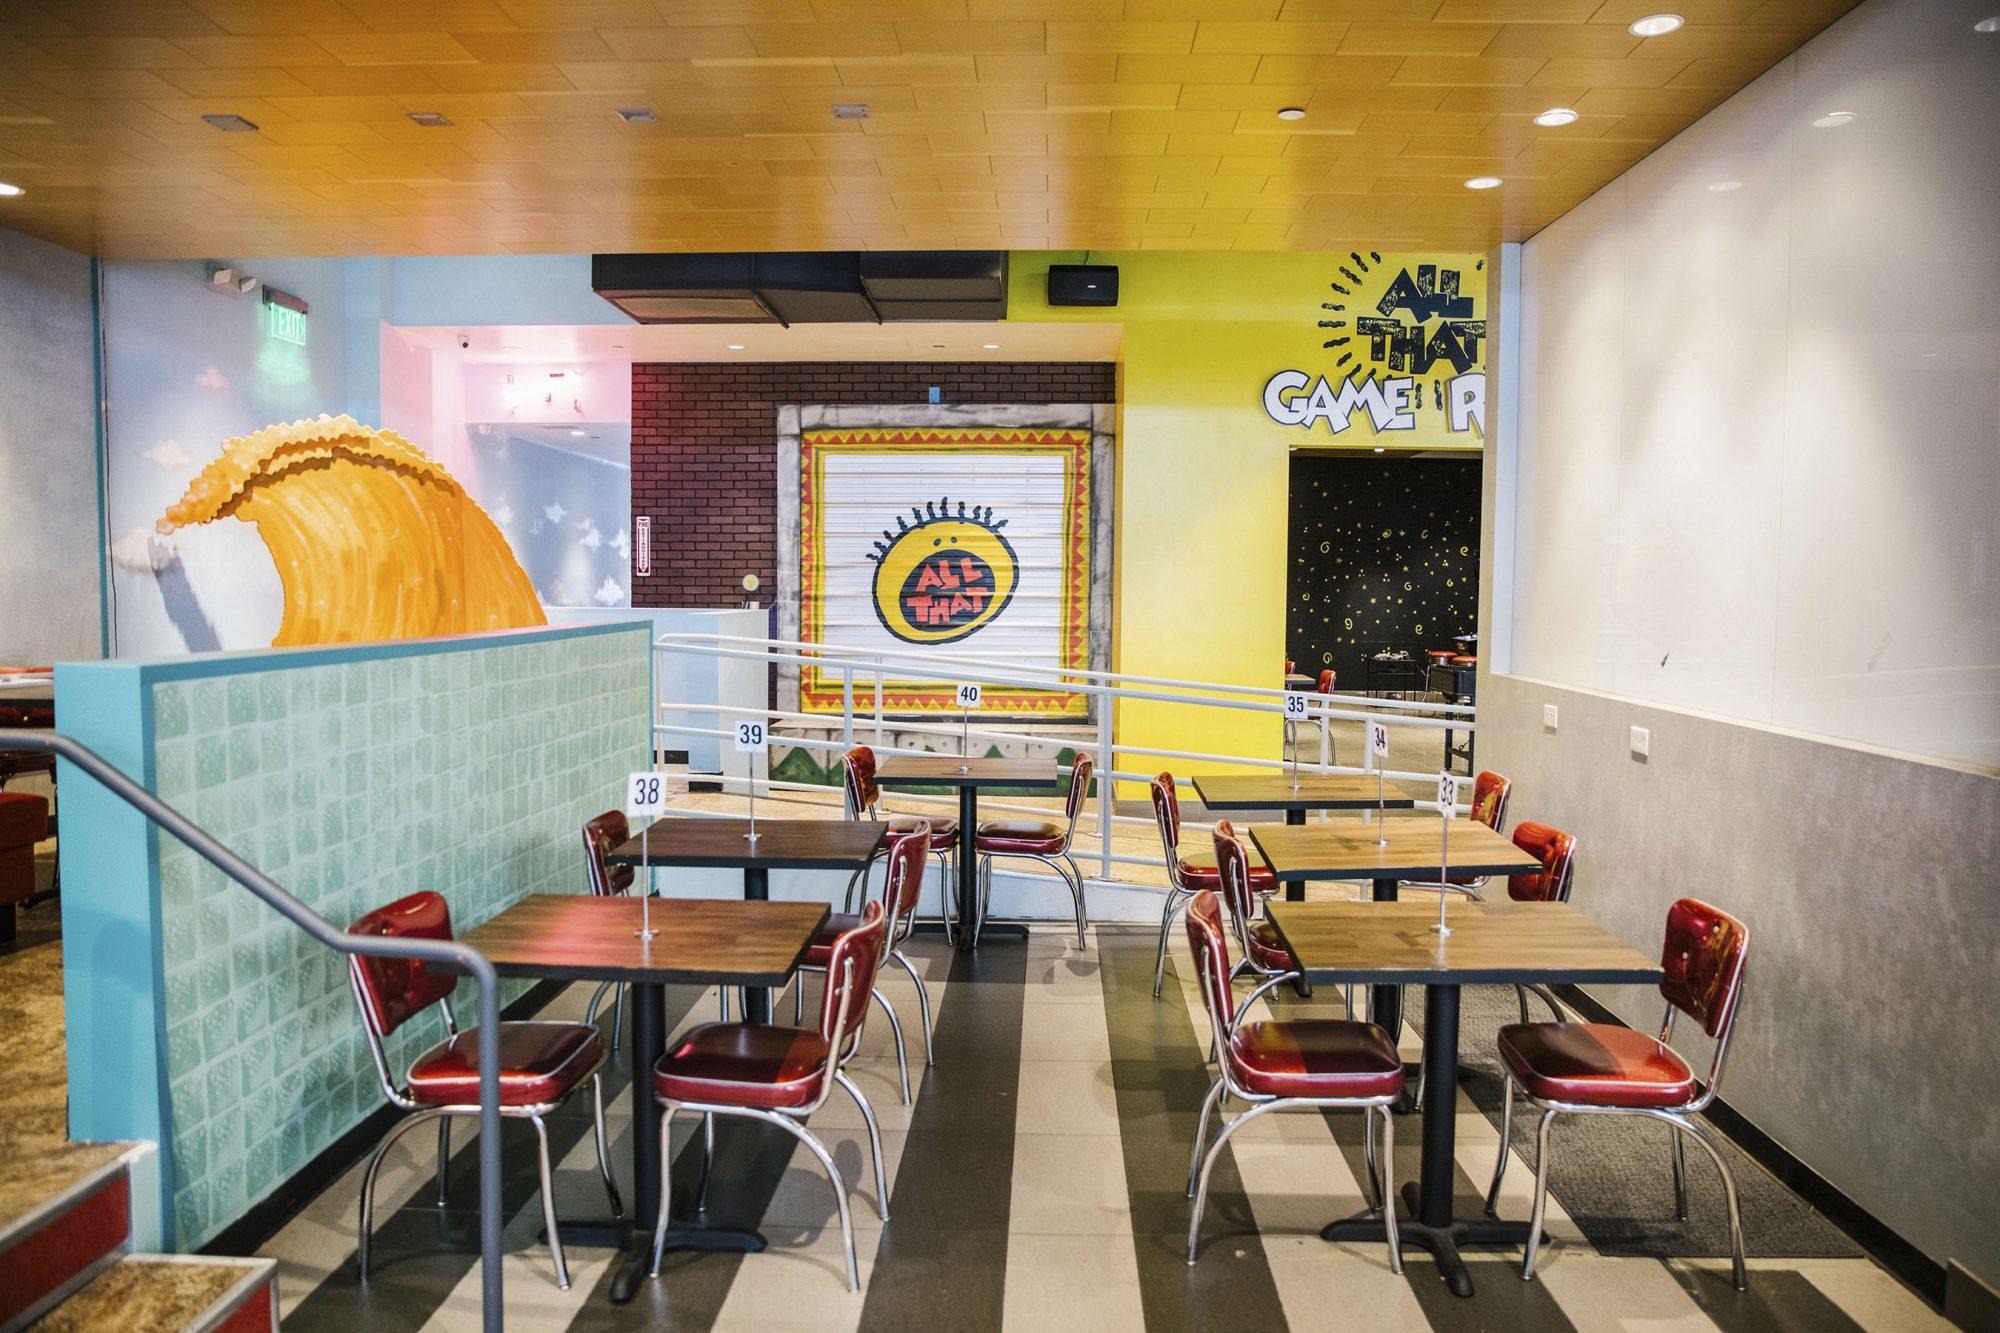 All ThatBTSGood Burger openingCR: Nickelodeon